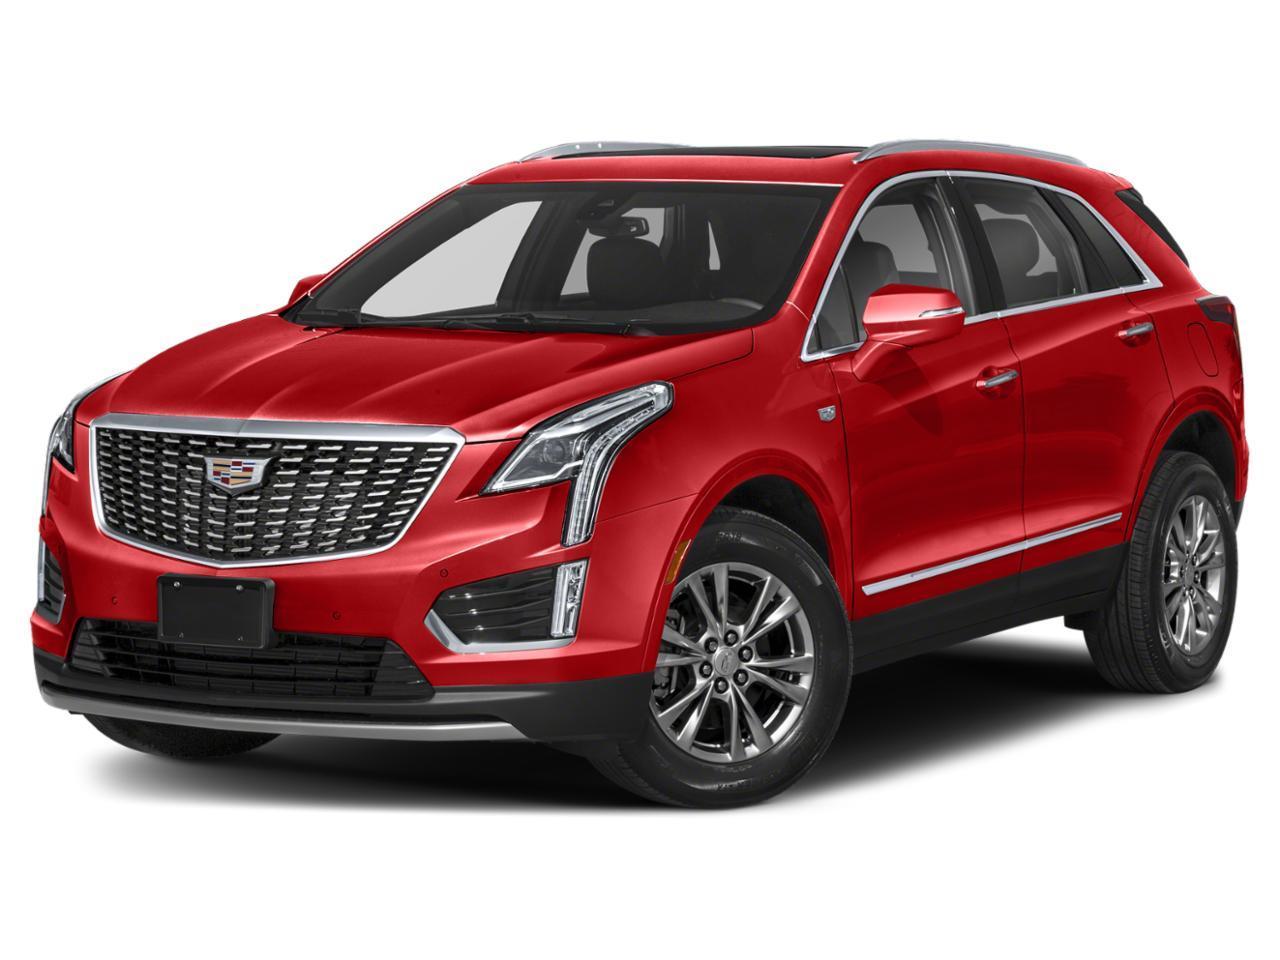 New       2021              Cadillac         XT5       FWD Premium Luxury